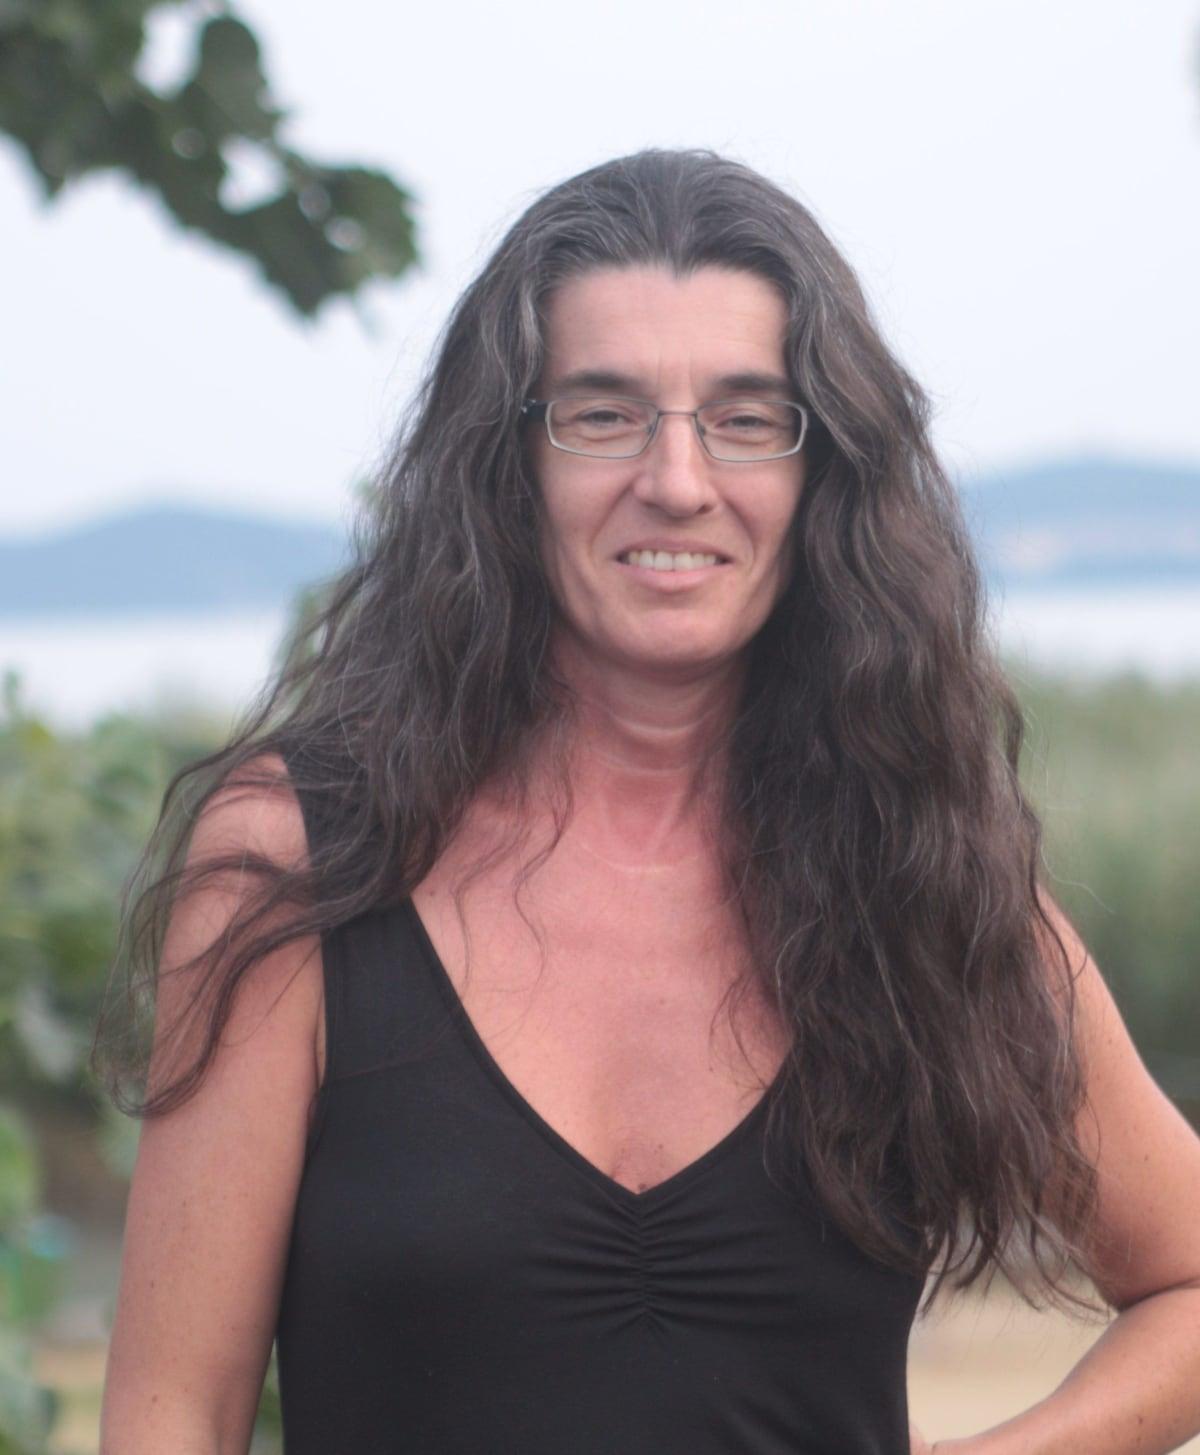 Manuela From Munich, Germany